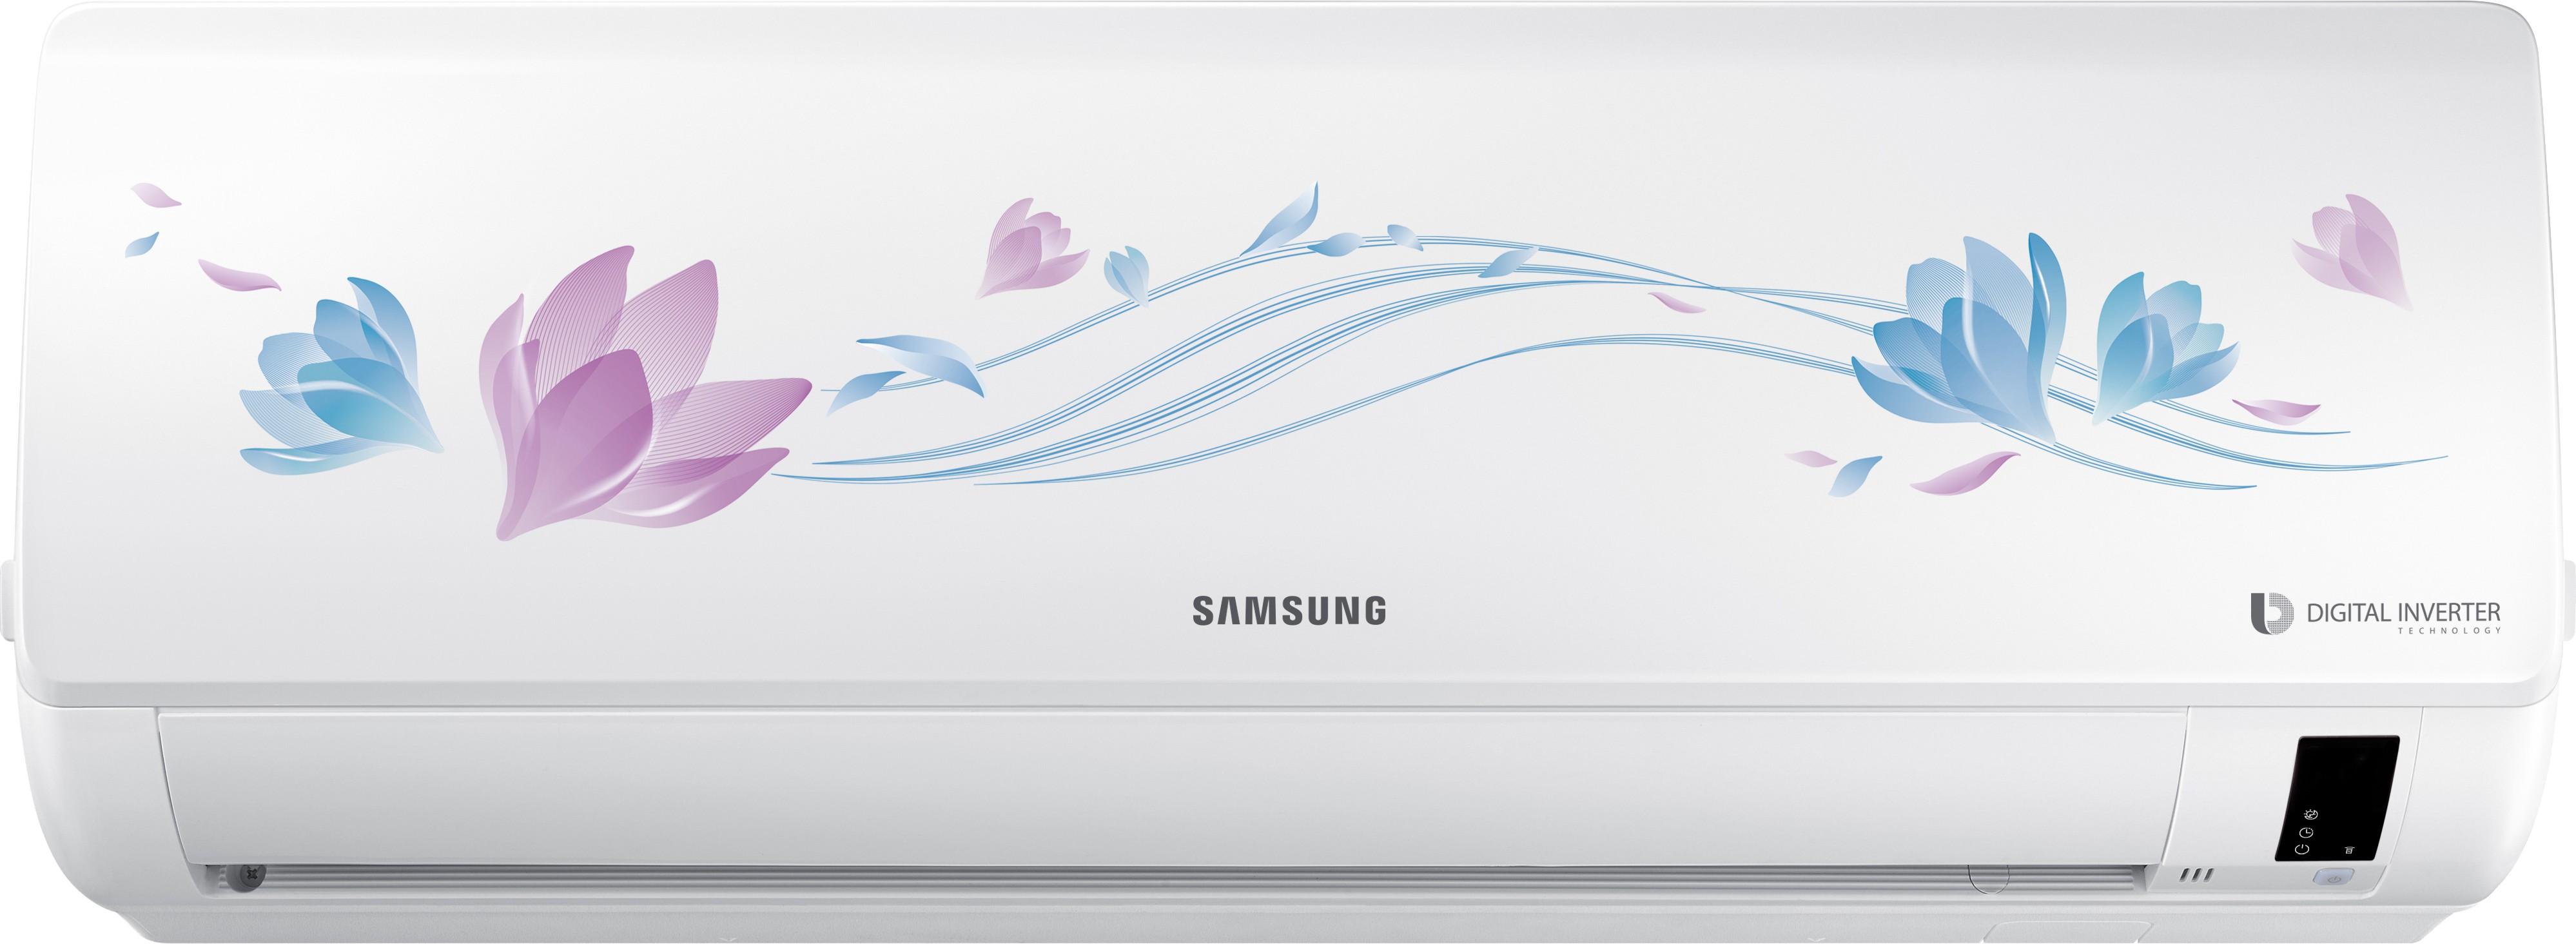 Samsung AR18NV3HFTV 1.5 Ton 3 Star BEE Rating 2018 Split AC Image